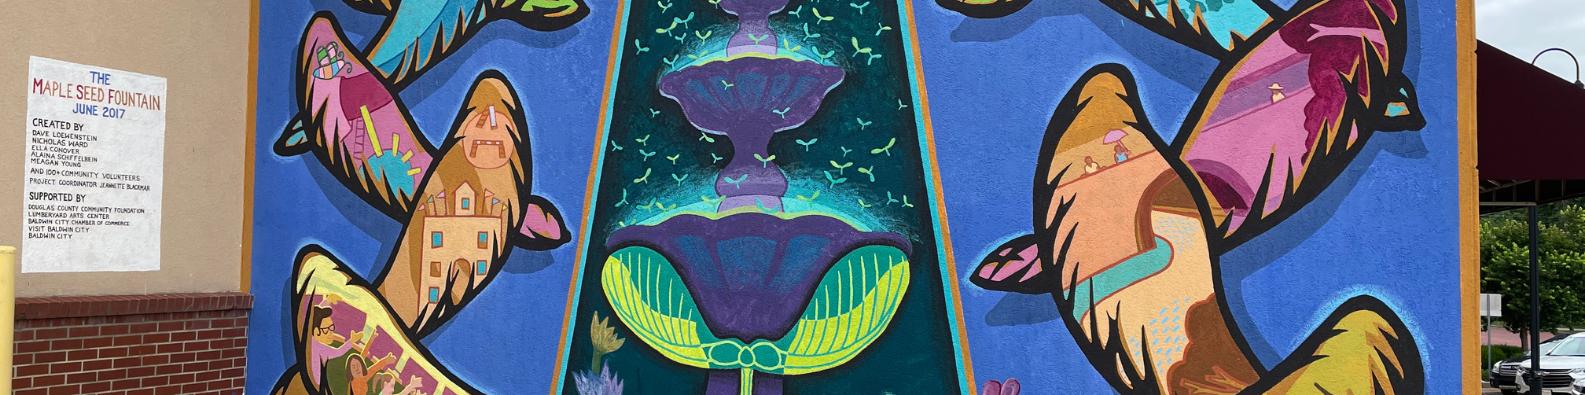 maple leaf mural